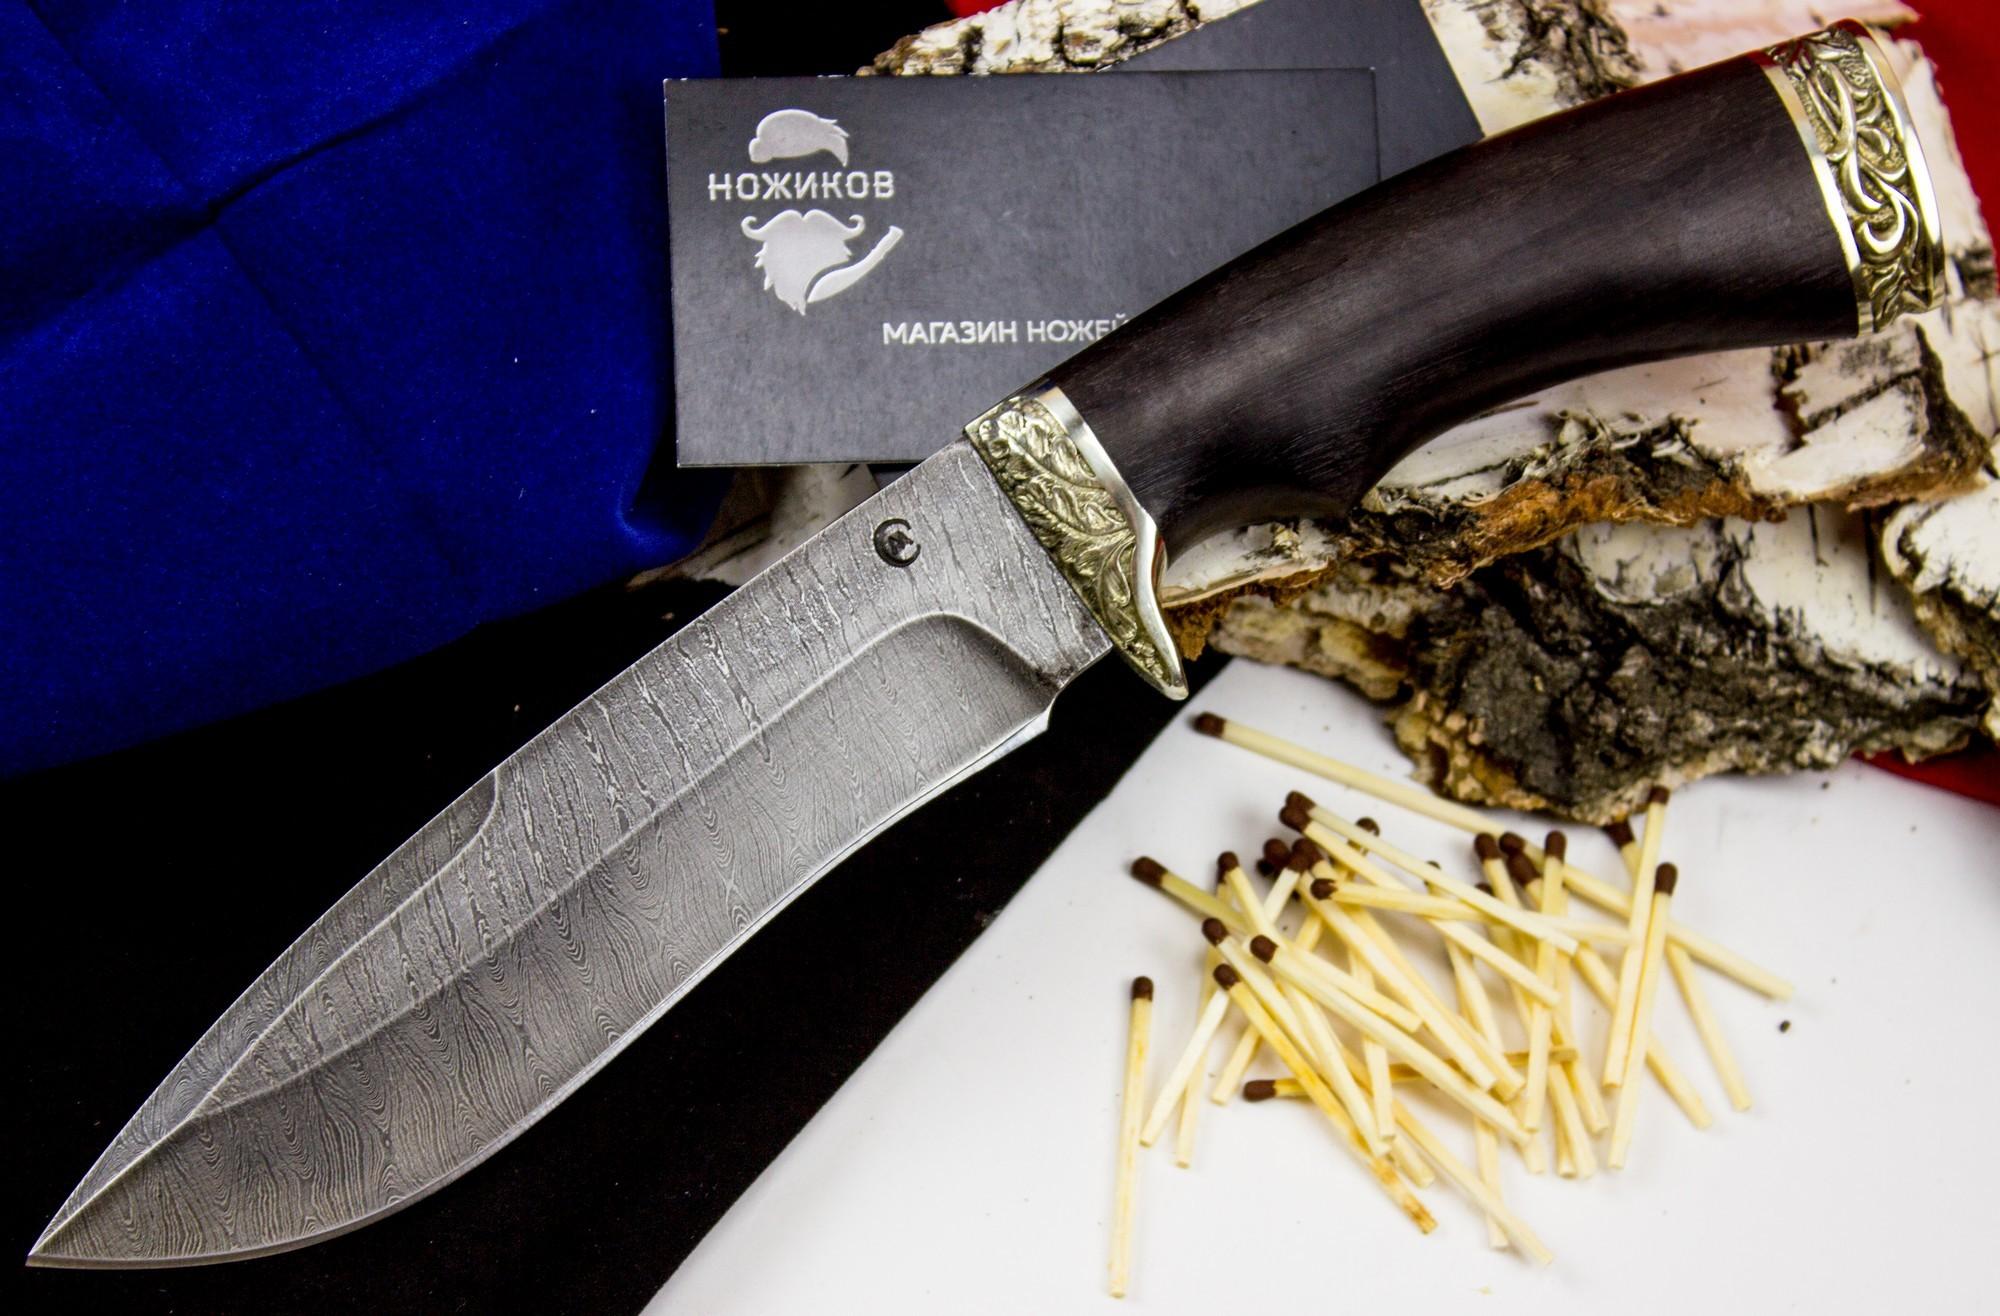 Нож Скиф, дамасская сталь, рукоять граб